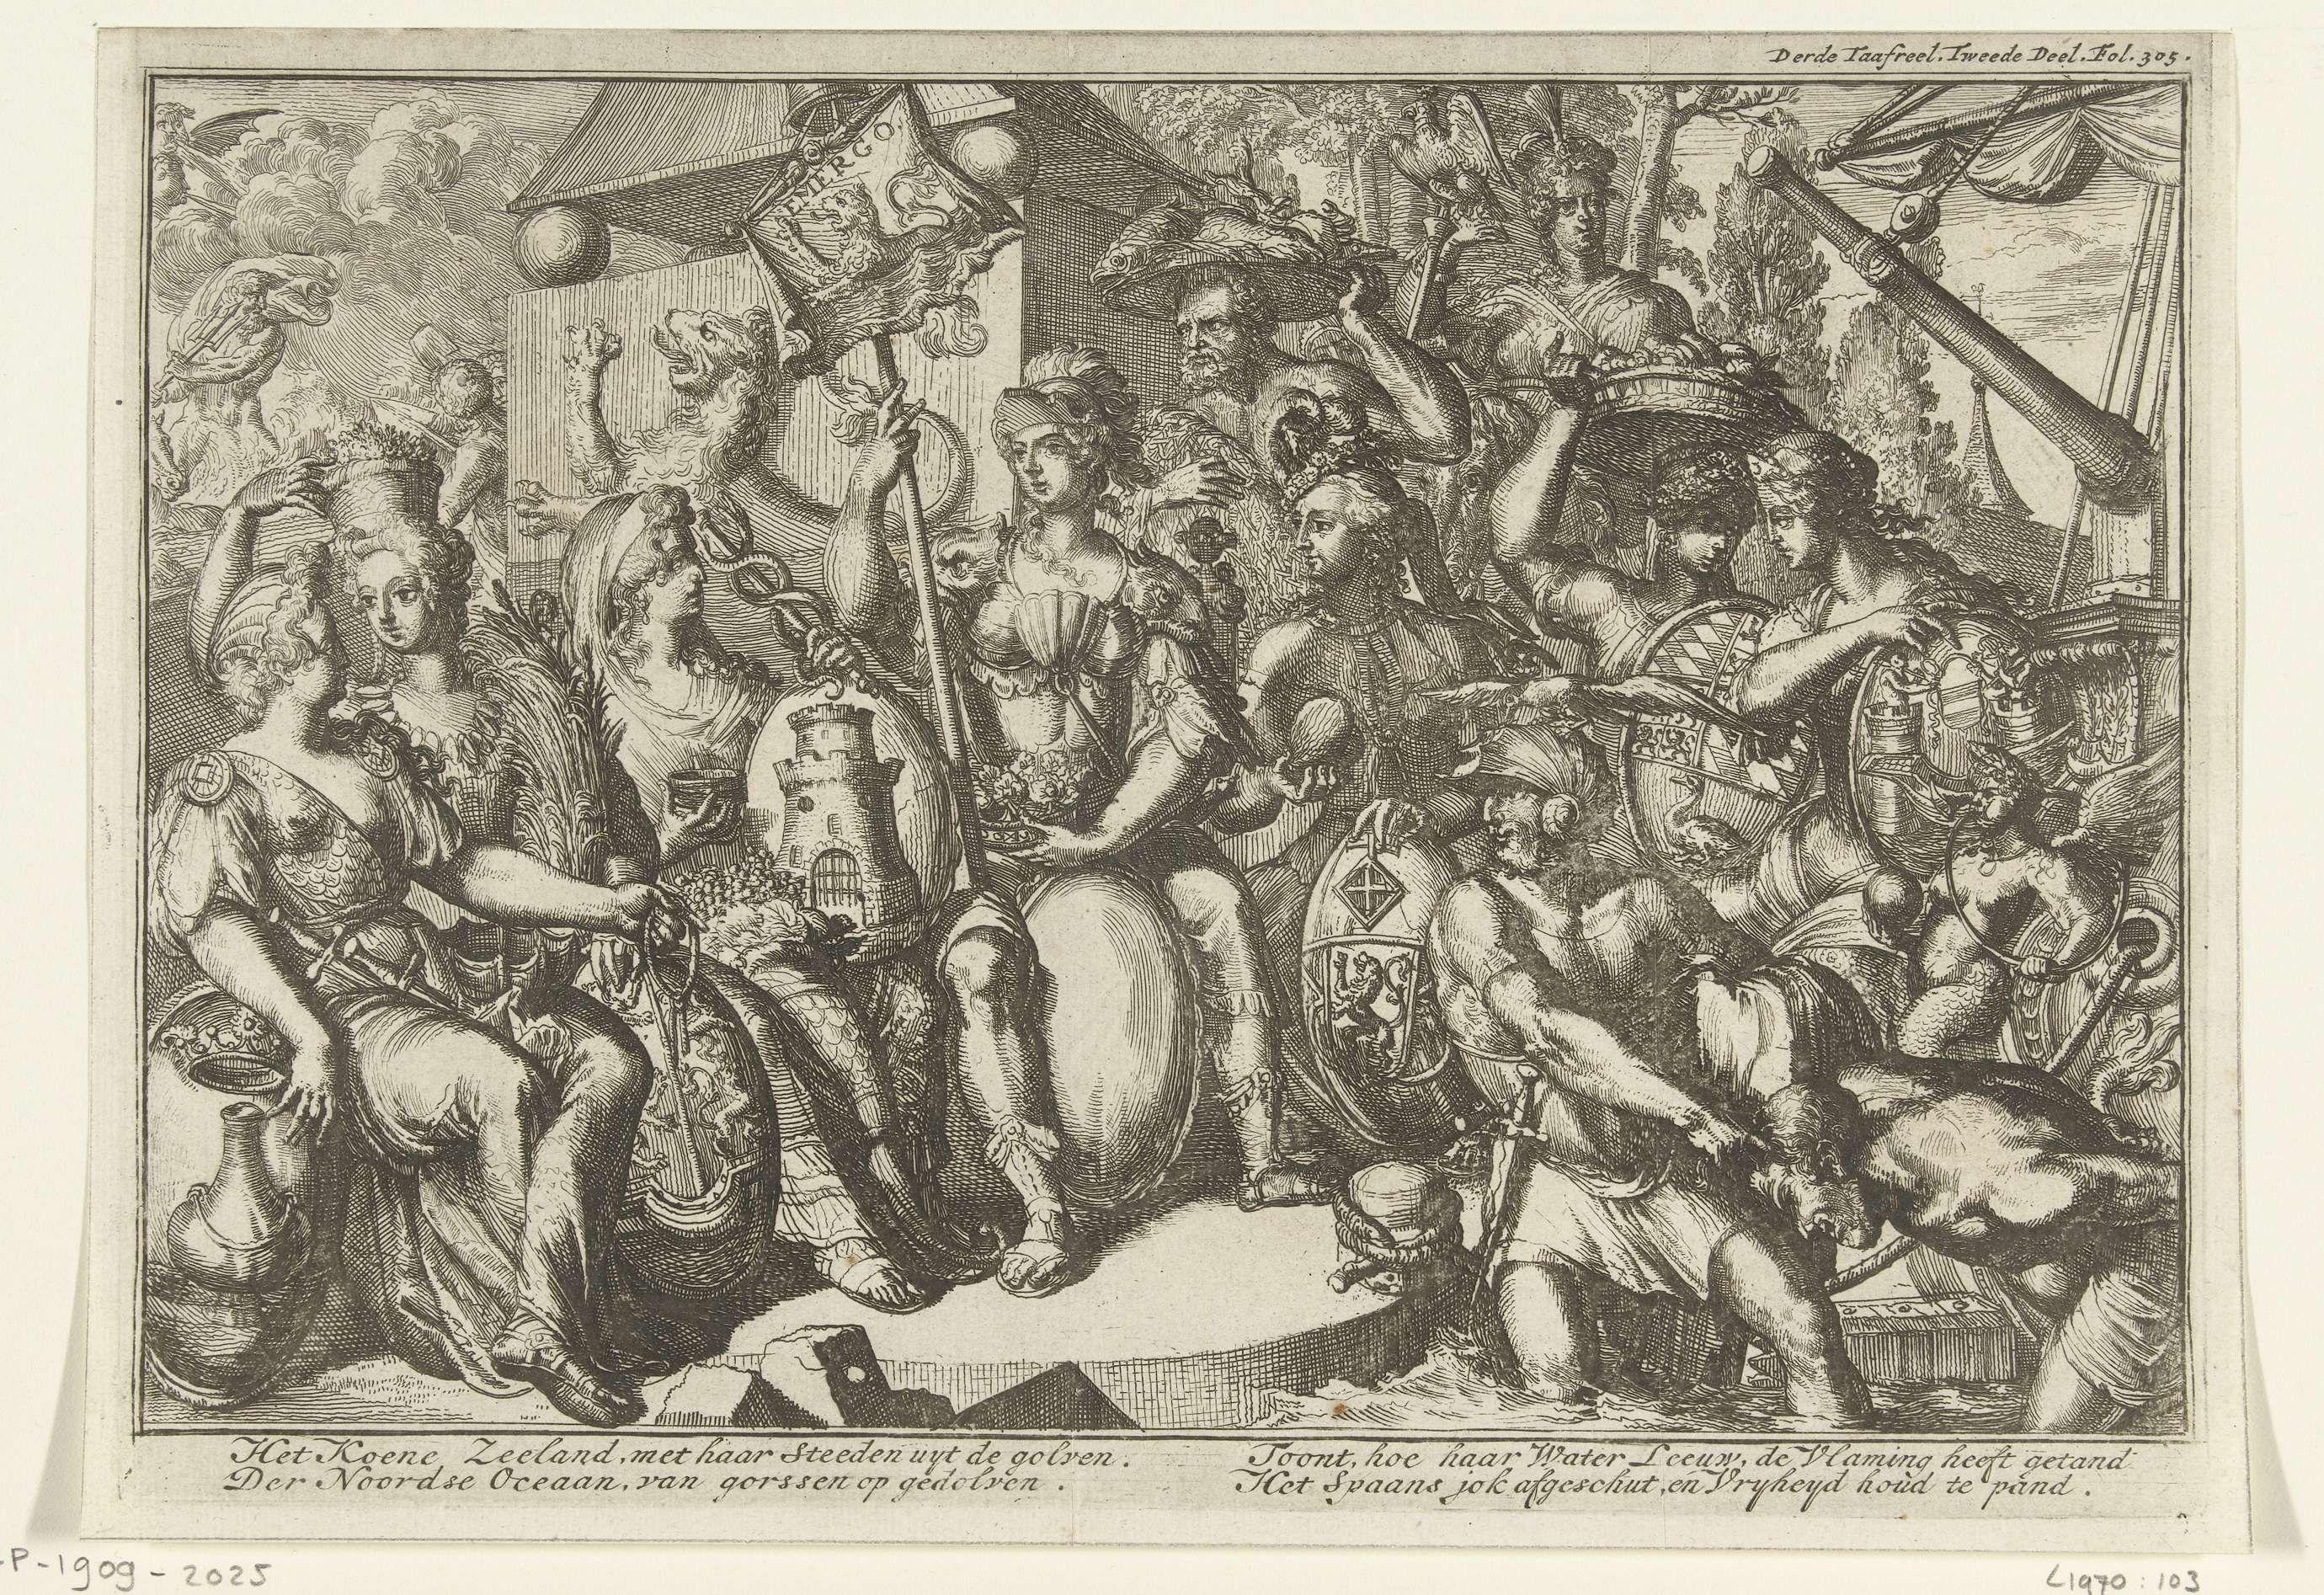 Romeyn de Hooghe | Allegorie met Zeeland, Romeyn de Hooghe, 1704 - 1706 |